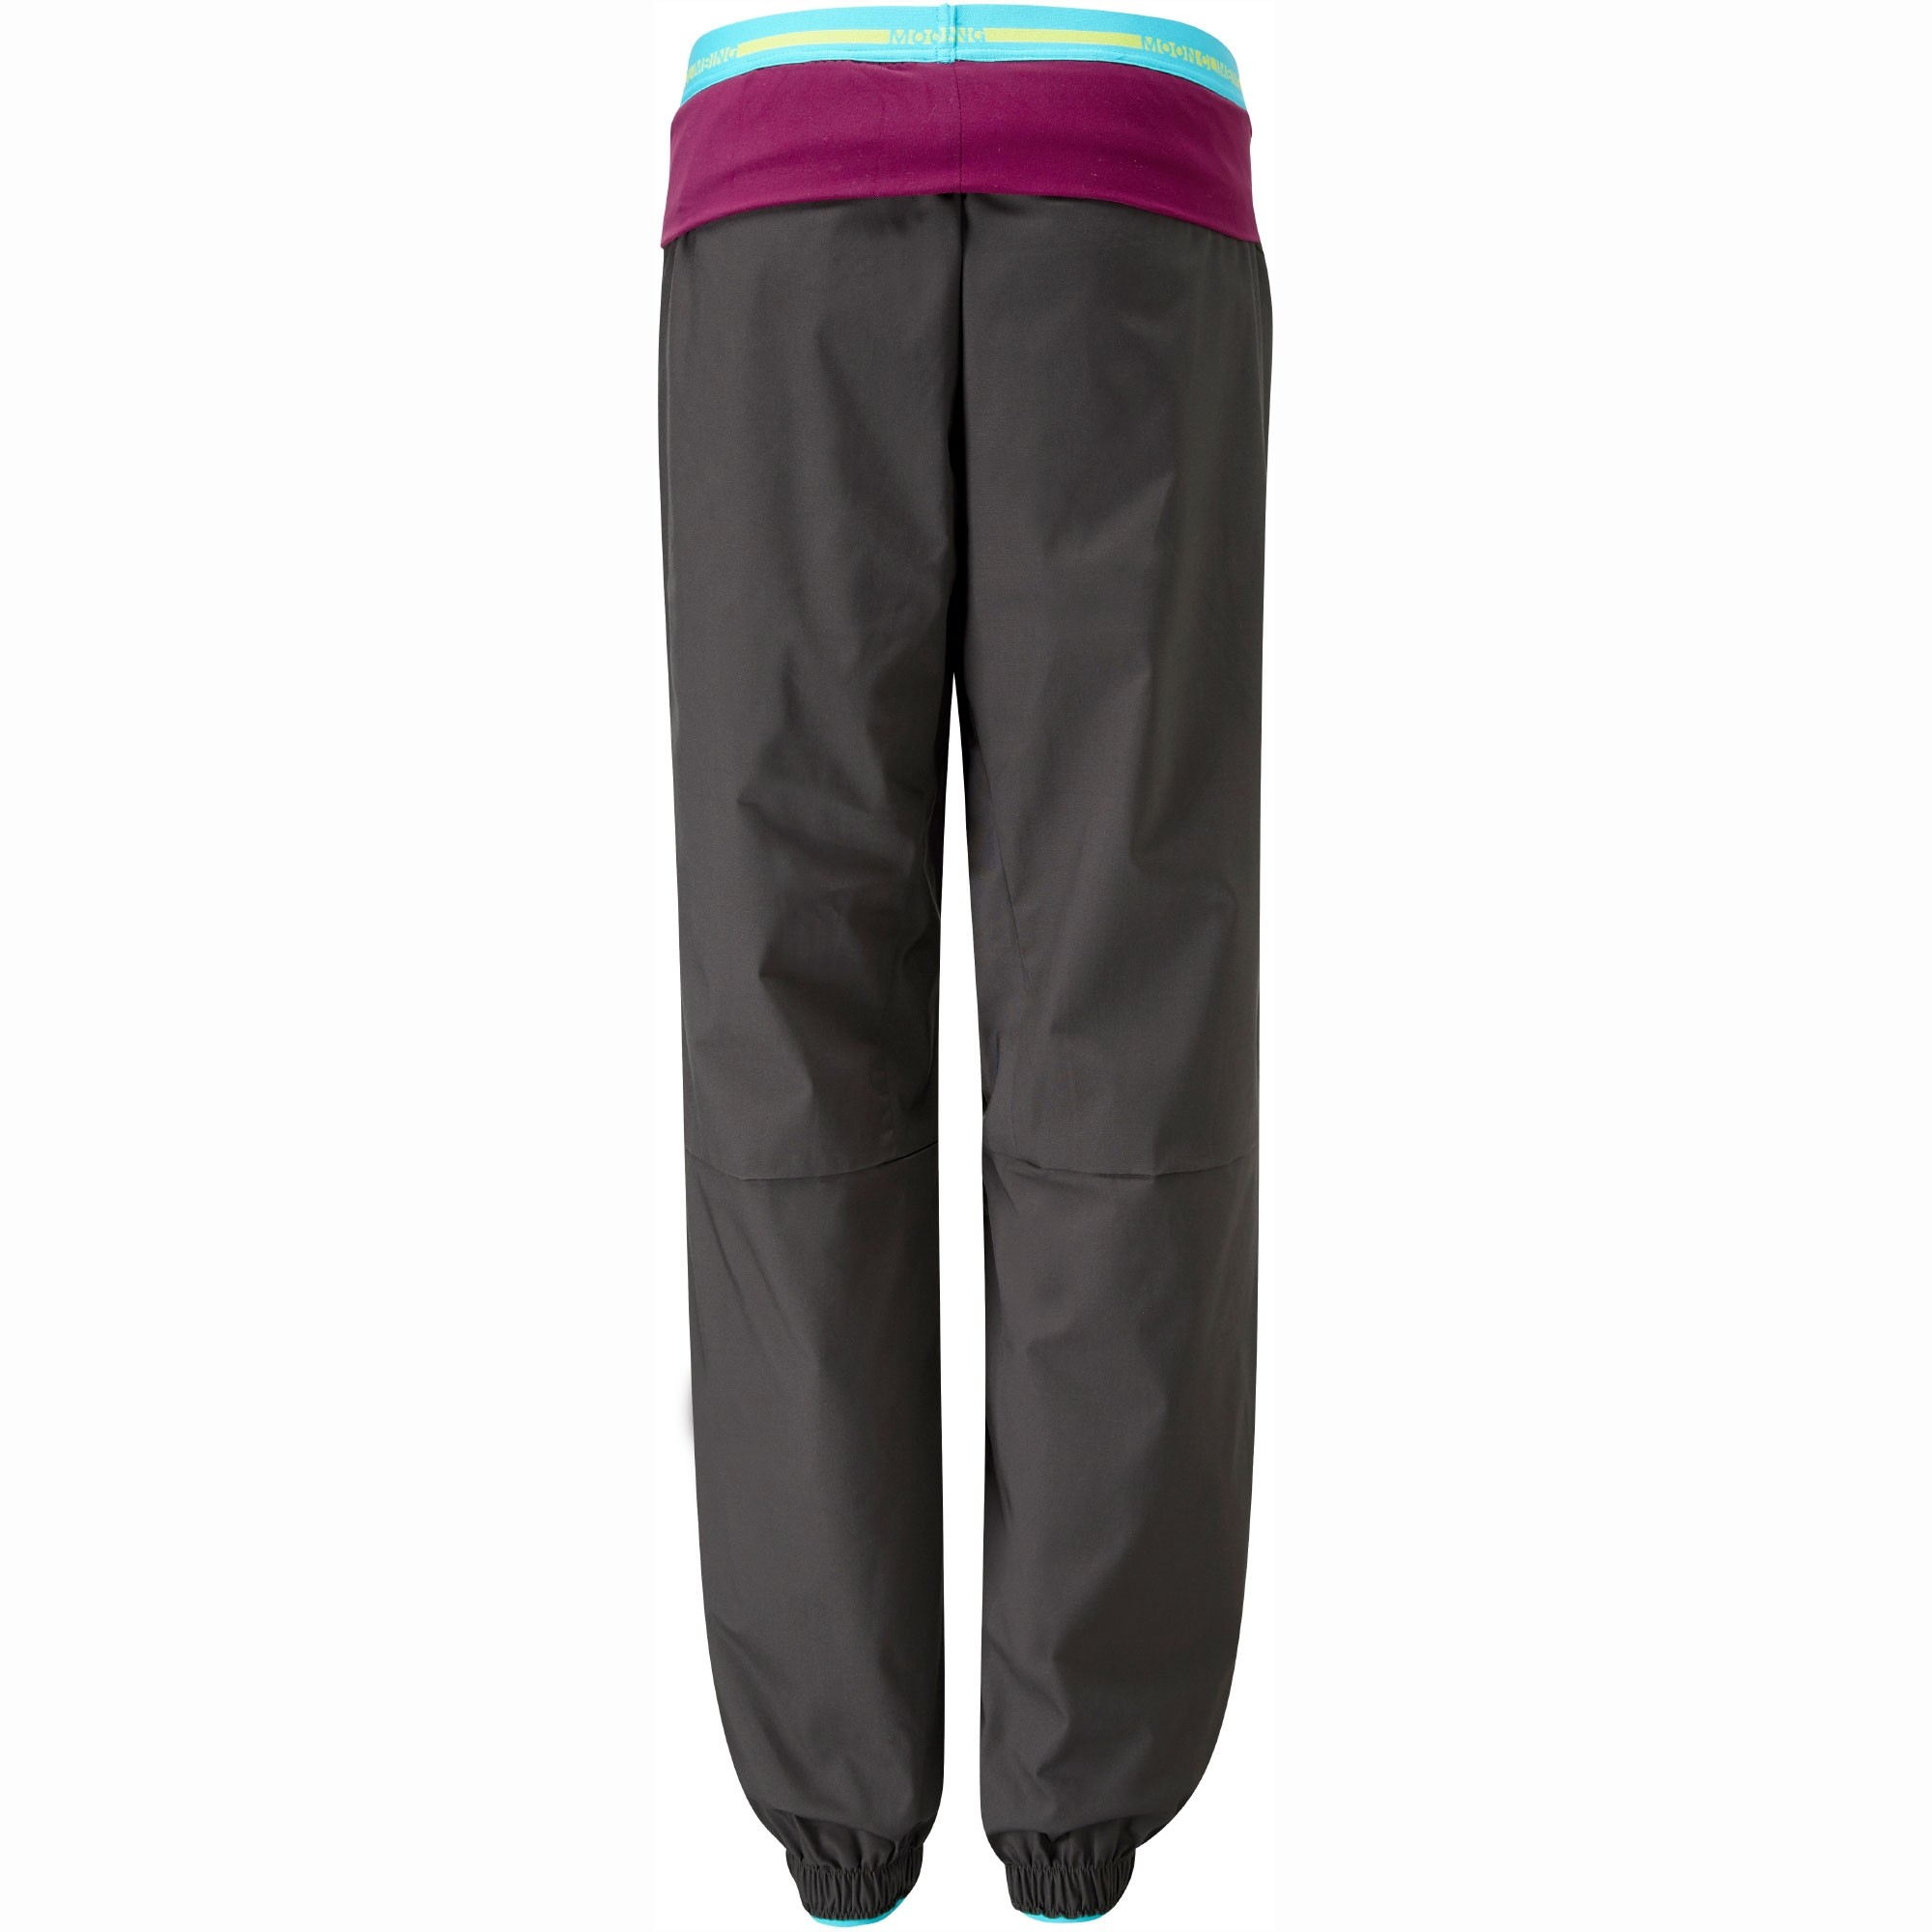 Moon Women's Samurai Pants - Charcoal - Back